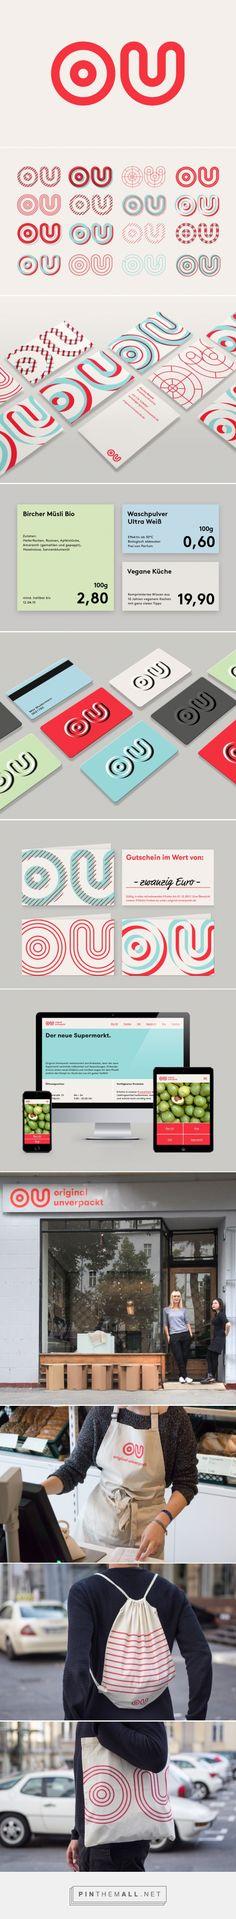 Orginal Unverpackt - http://www.designmadeingermany.de/2014/63786/